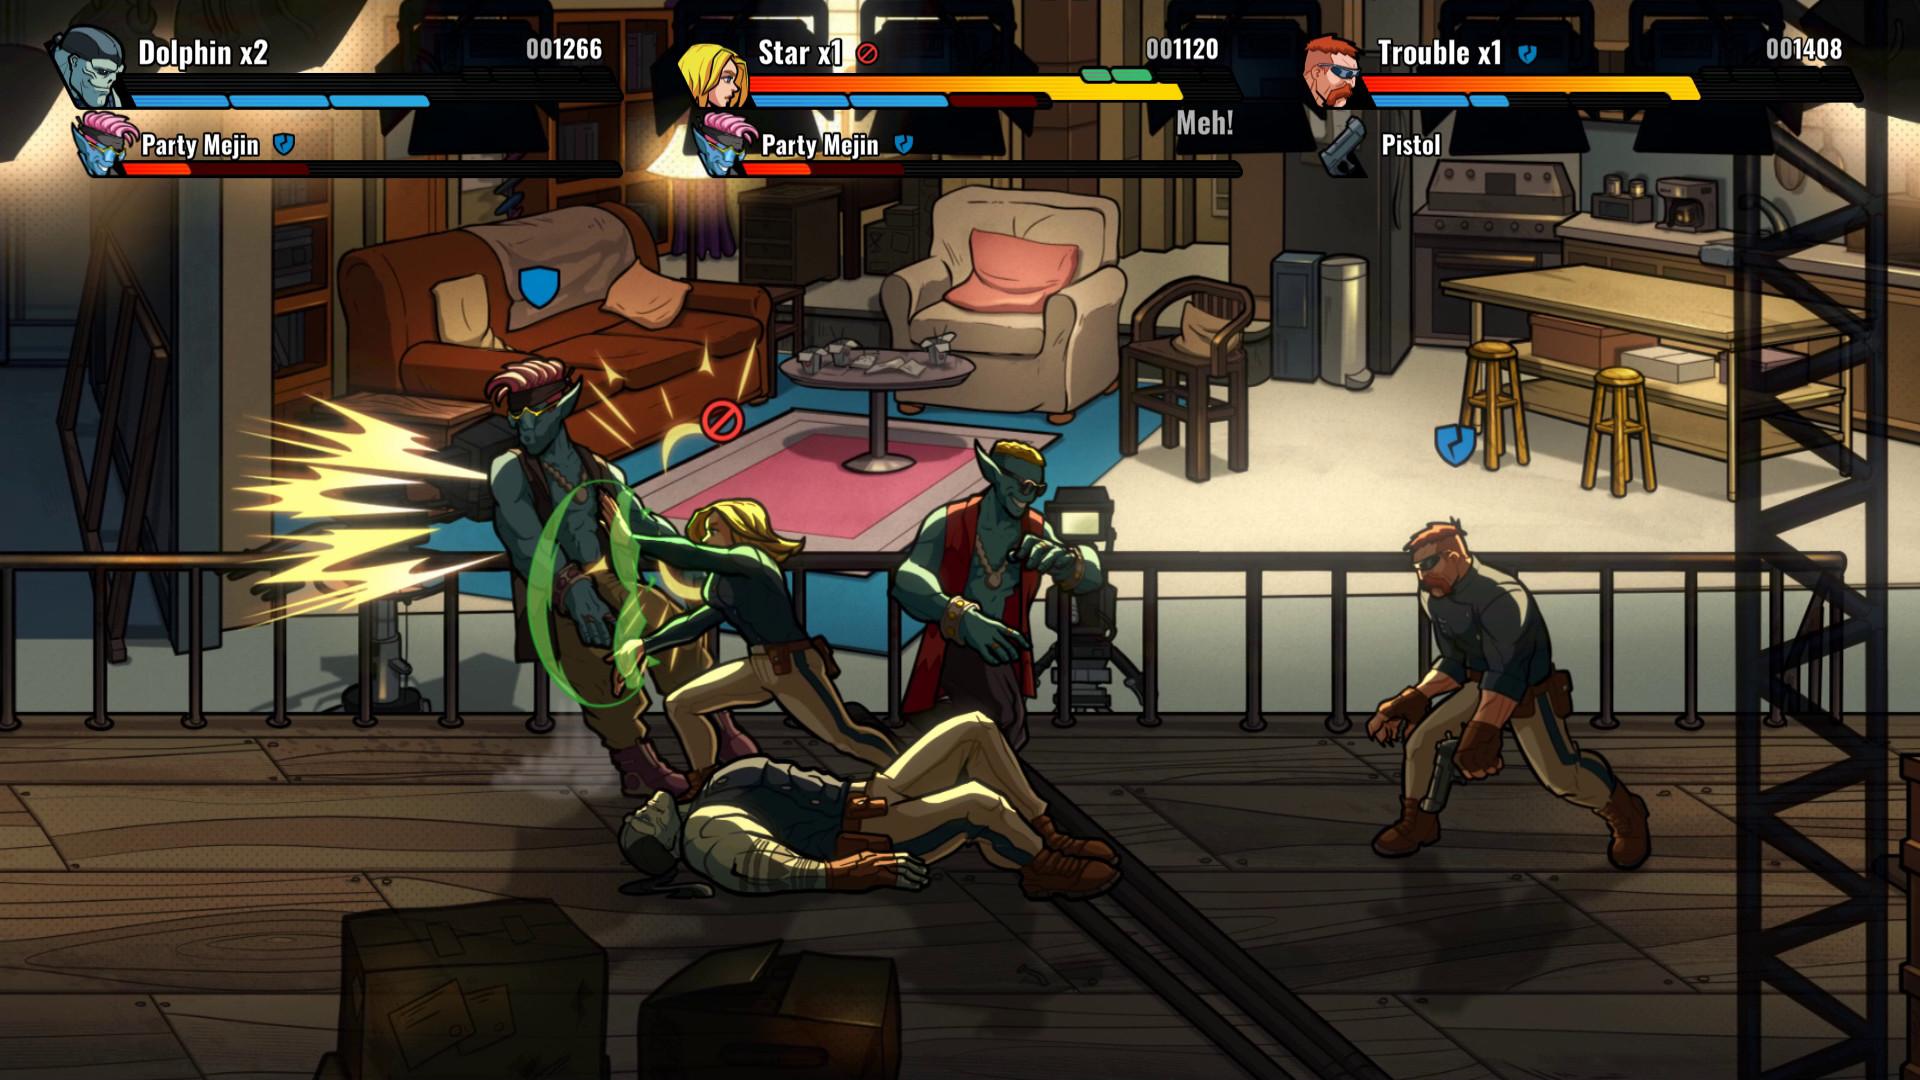 mayhem-brawler-pc-screenshot-4